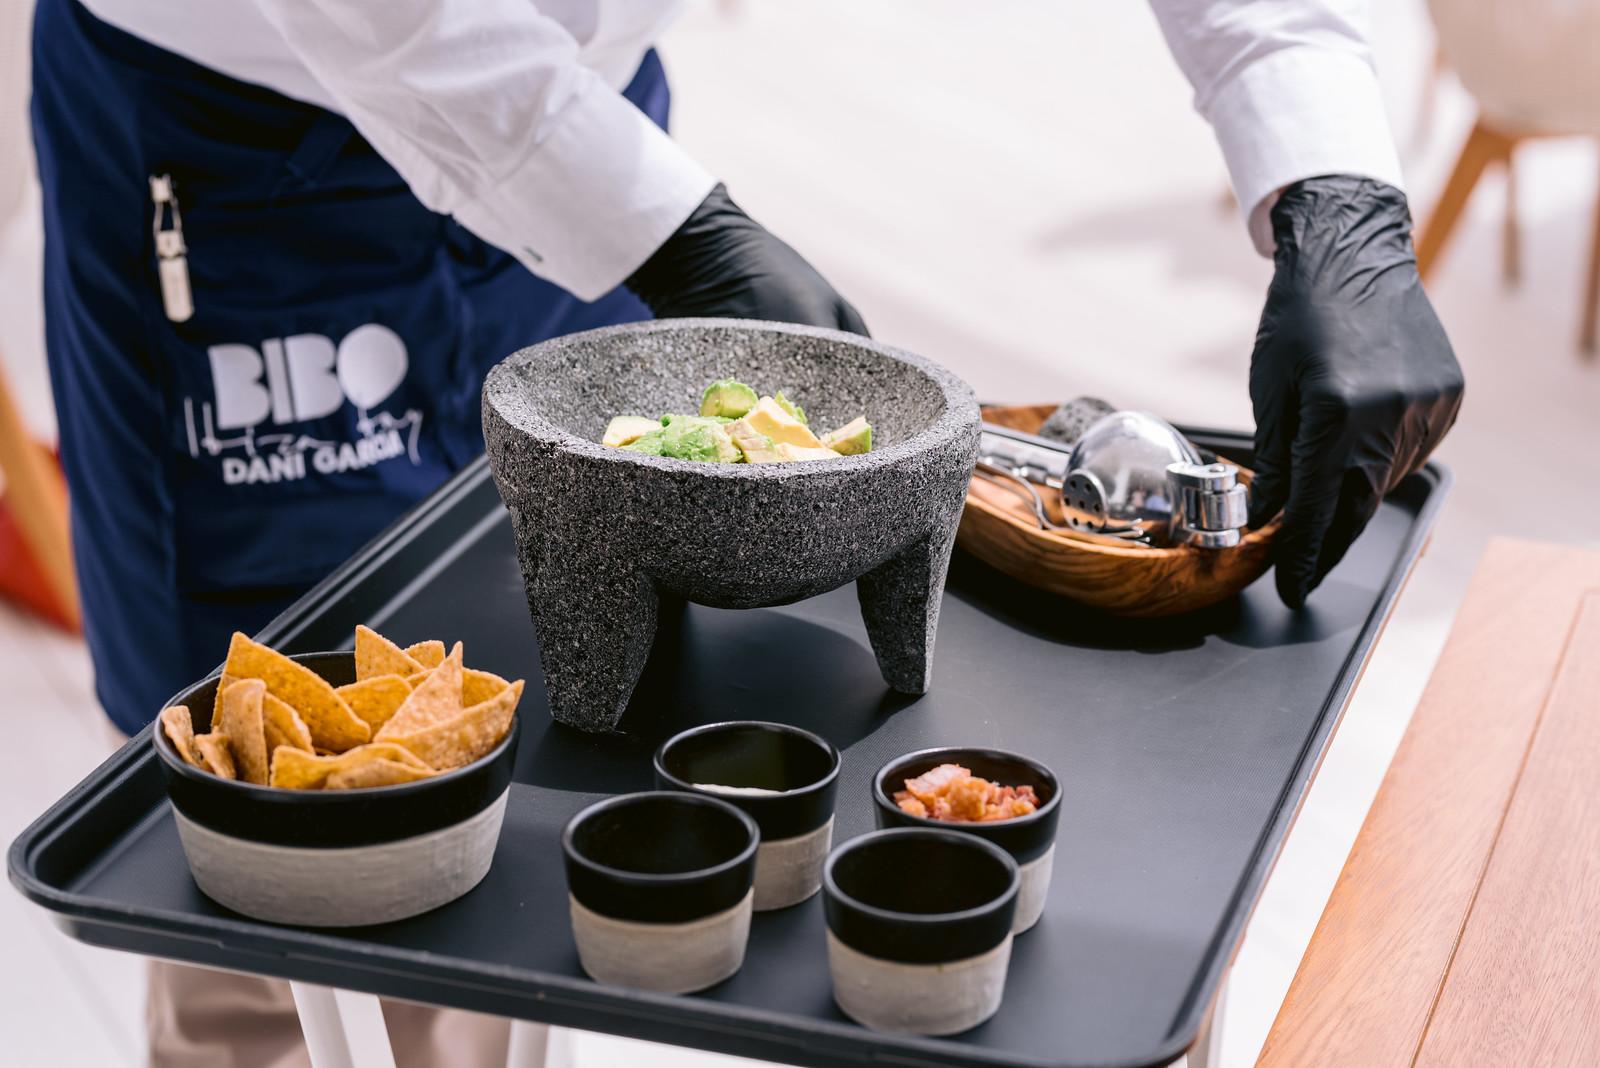 https://www.white-ibiza.com/wp-content/uploads/2021/06/white-ibiza-restaurants-bibo-ibiza-bay-03.jpg